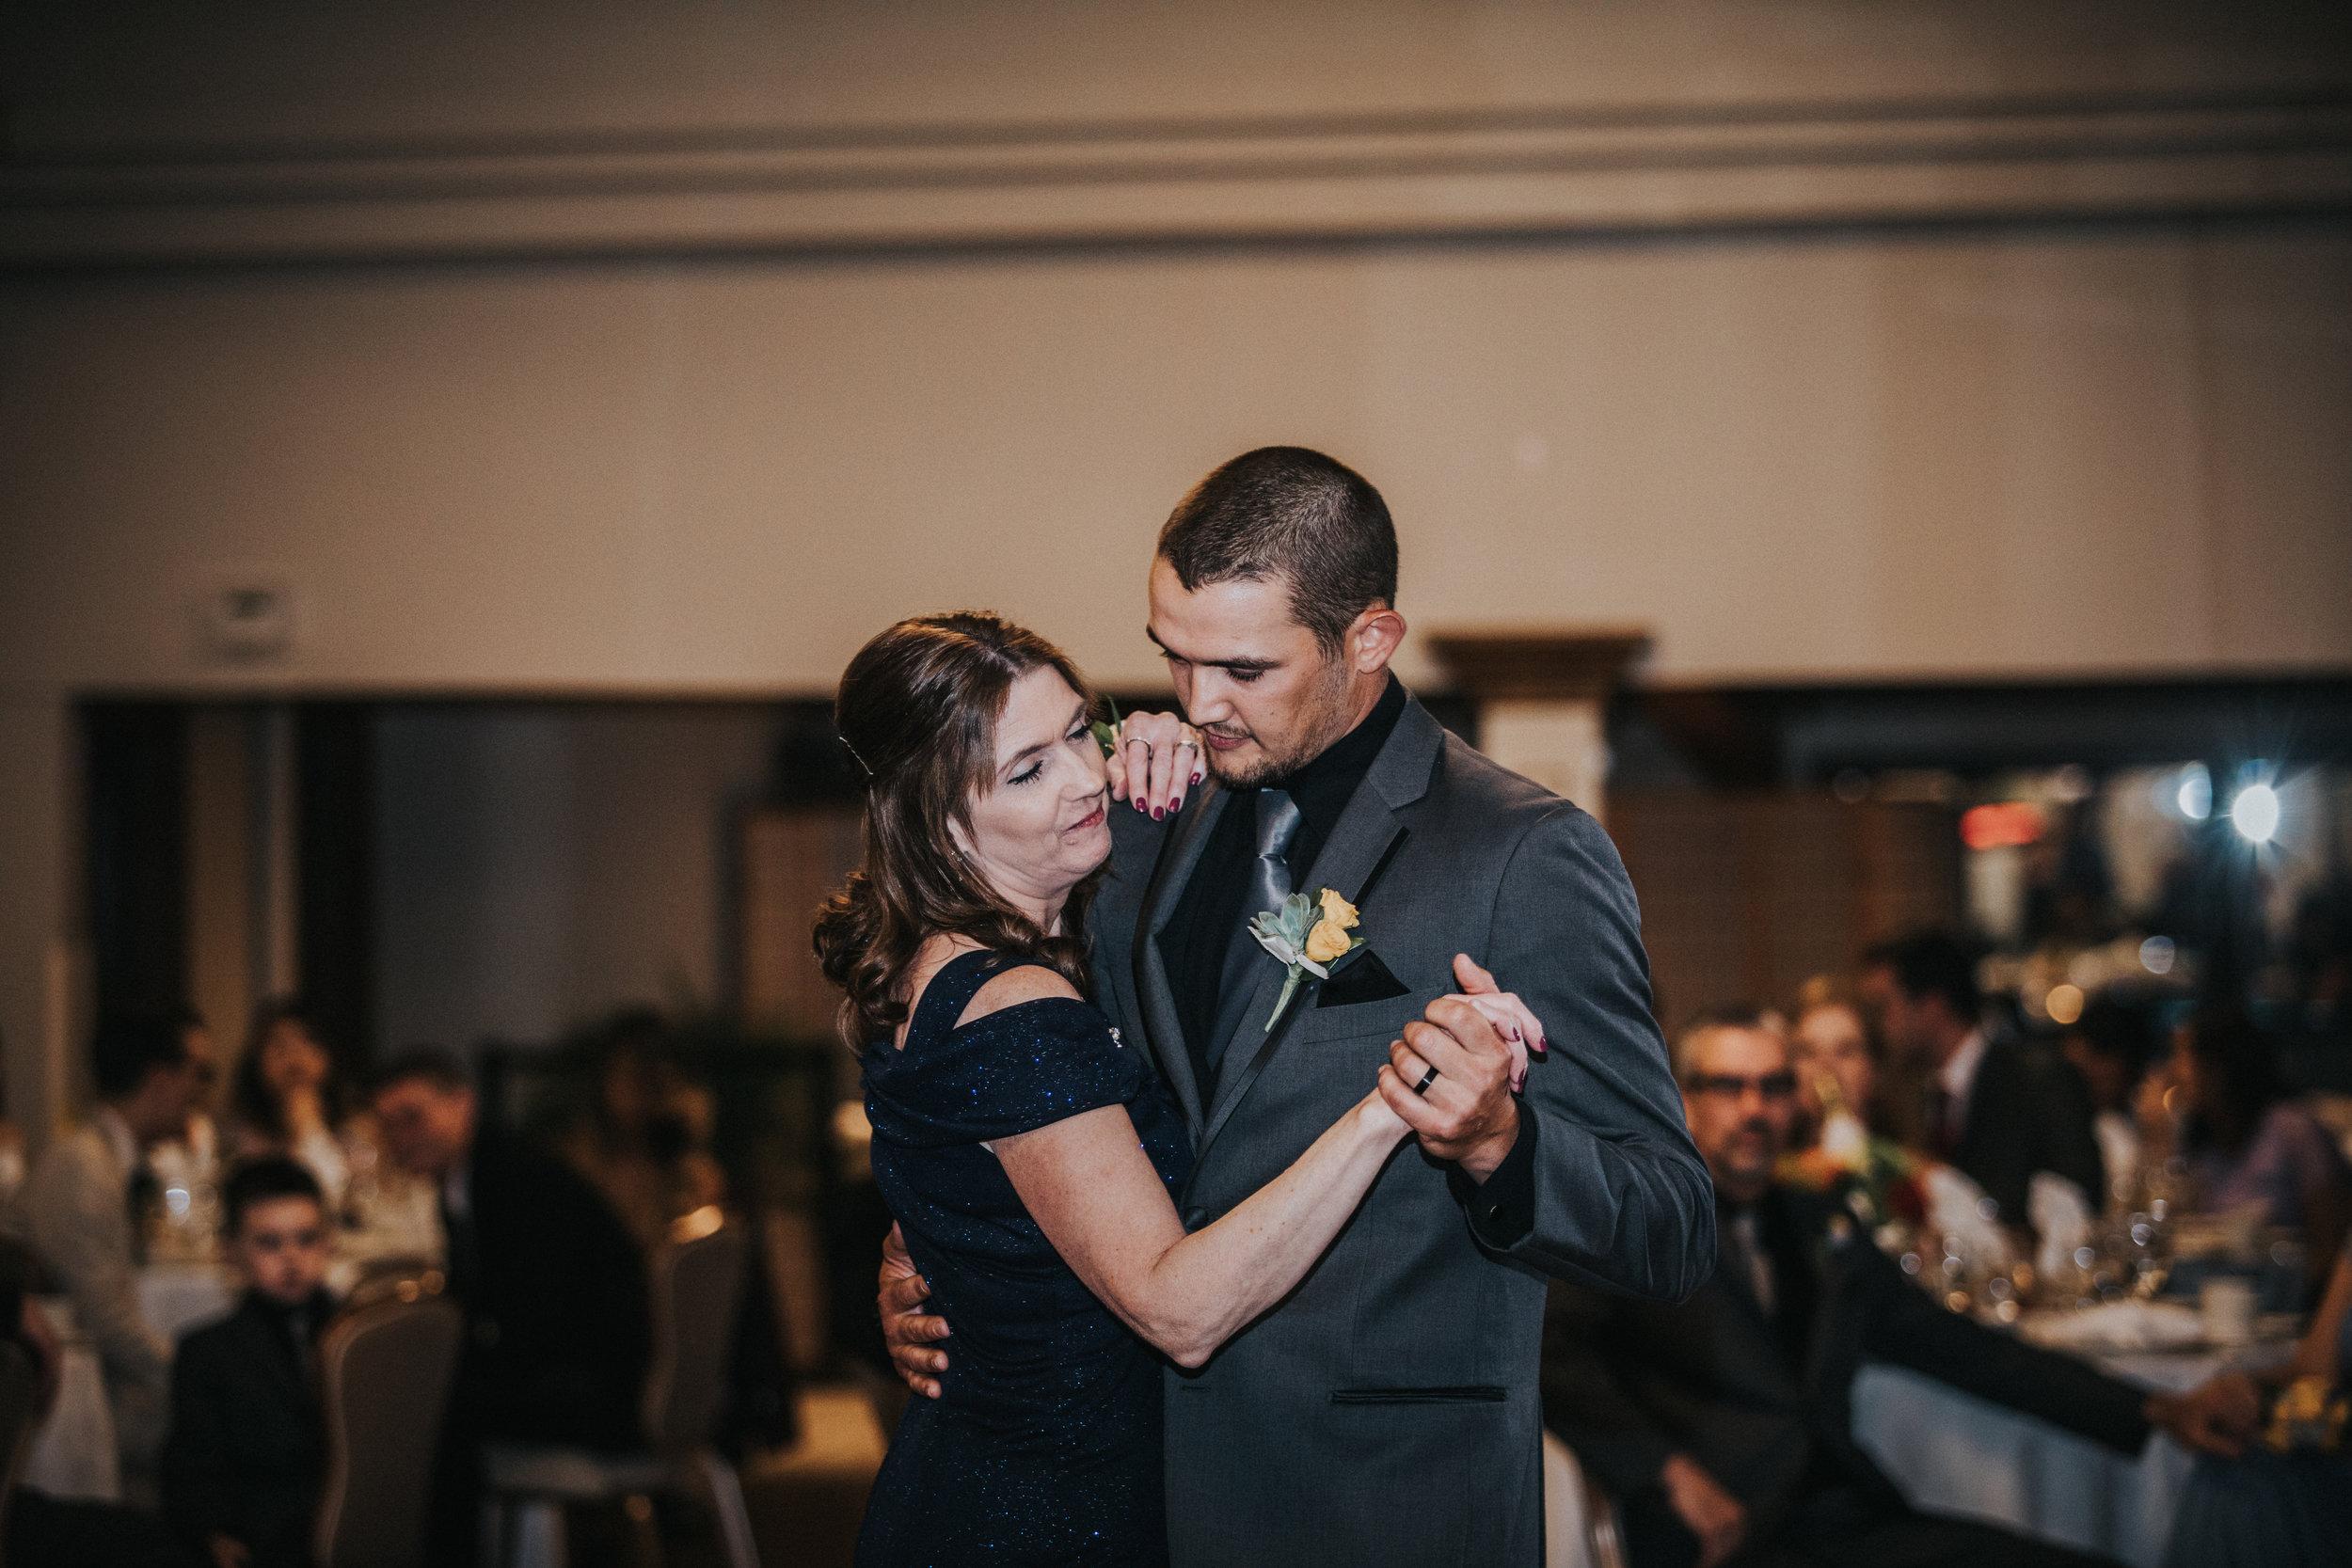 New-Jersey-Wedding-Photographer-Megan&Nick-Reception-62.jpg